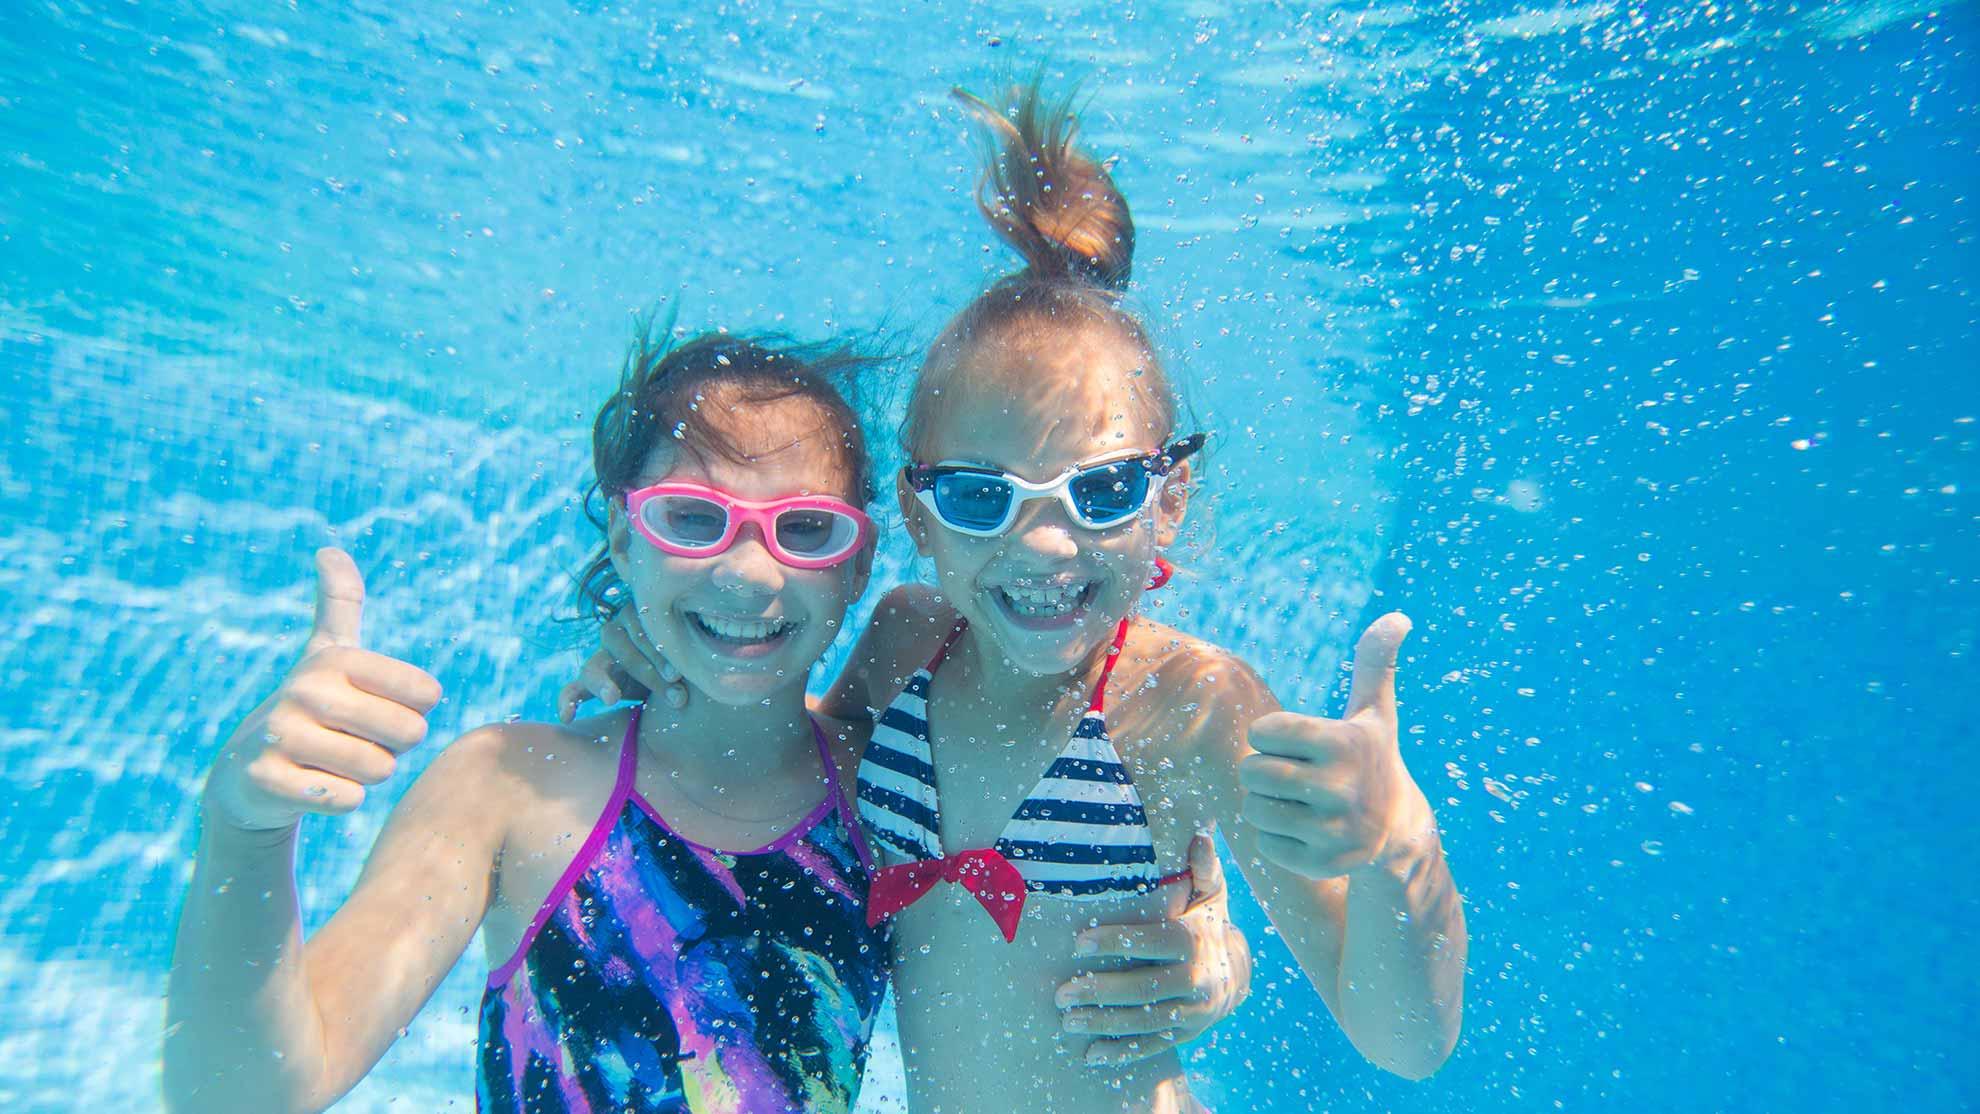 ZomerbadPeize 2020 Recreatiezwemmen